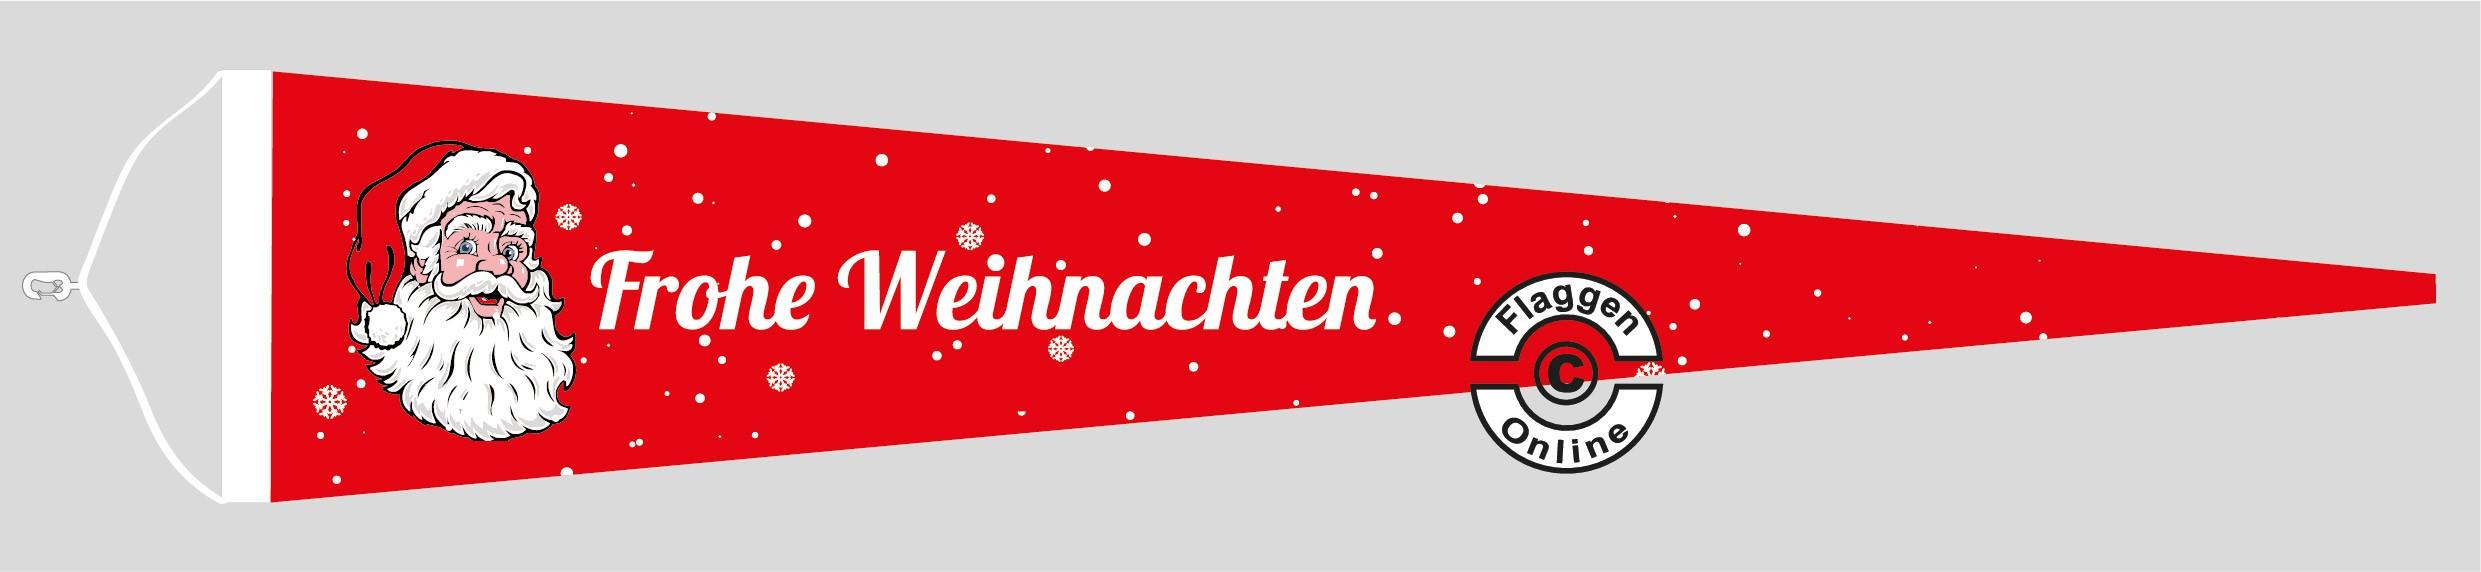 Frohe Weihnachten rot Langwimpel mit Querholz